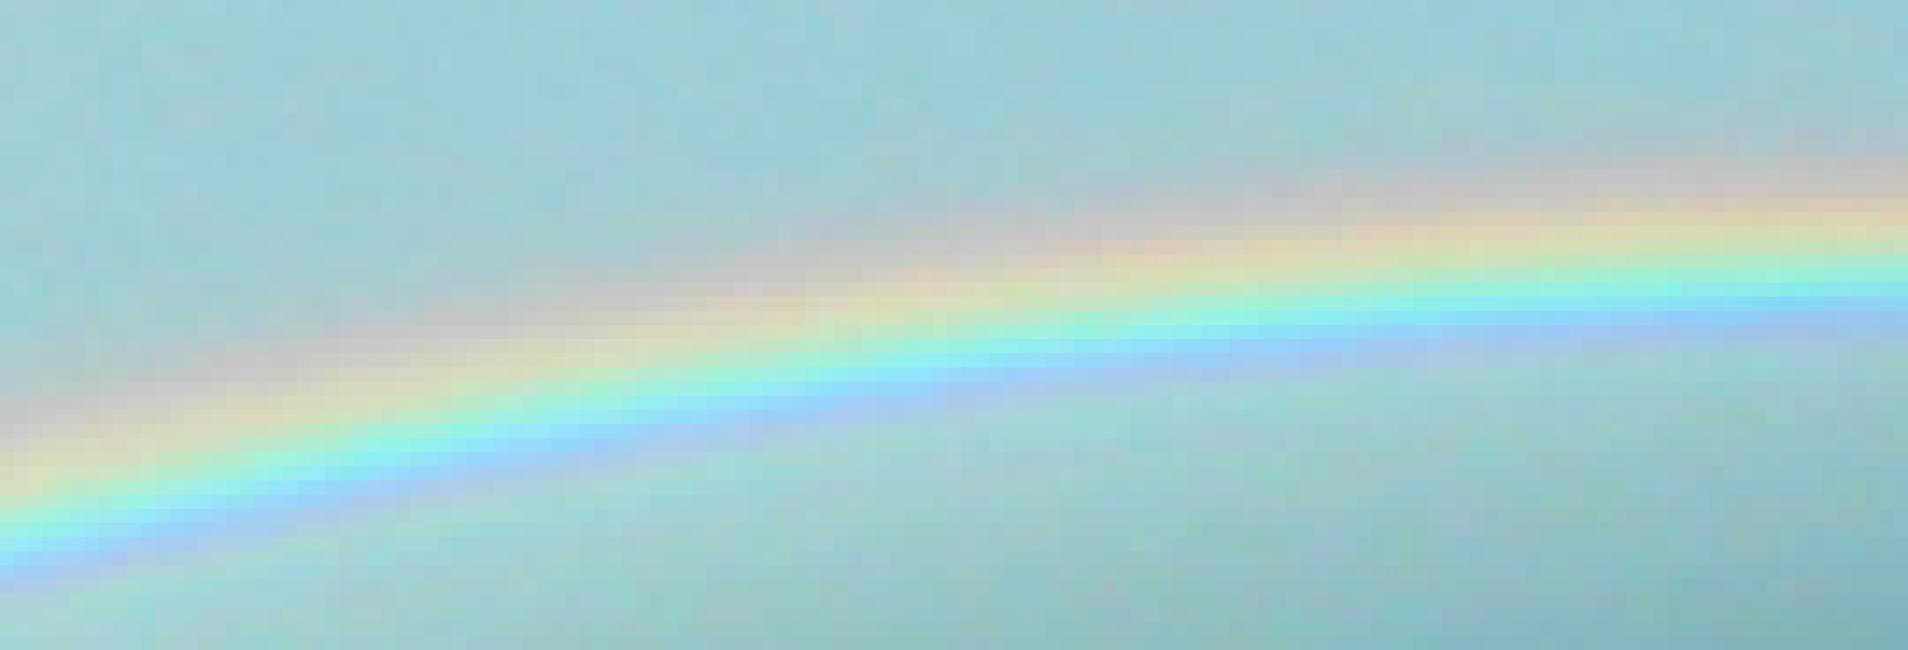 Rainbow detail soft shining in blue sky